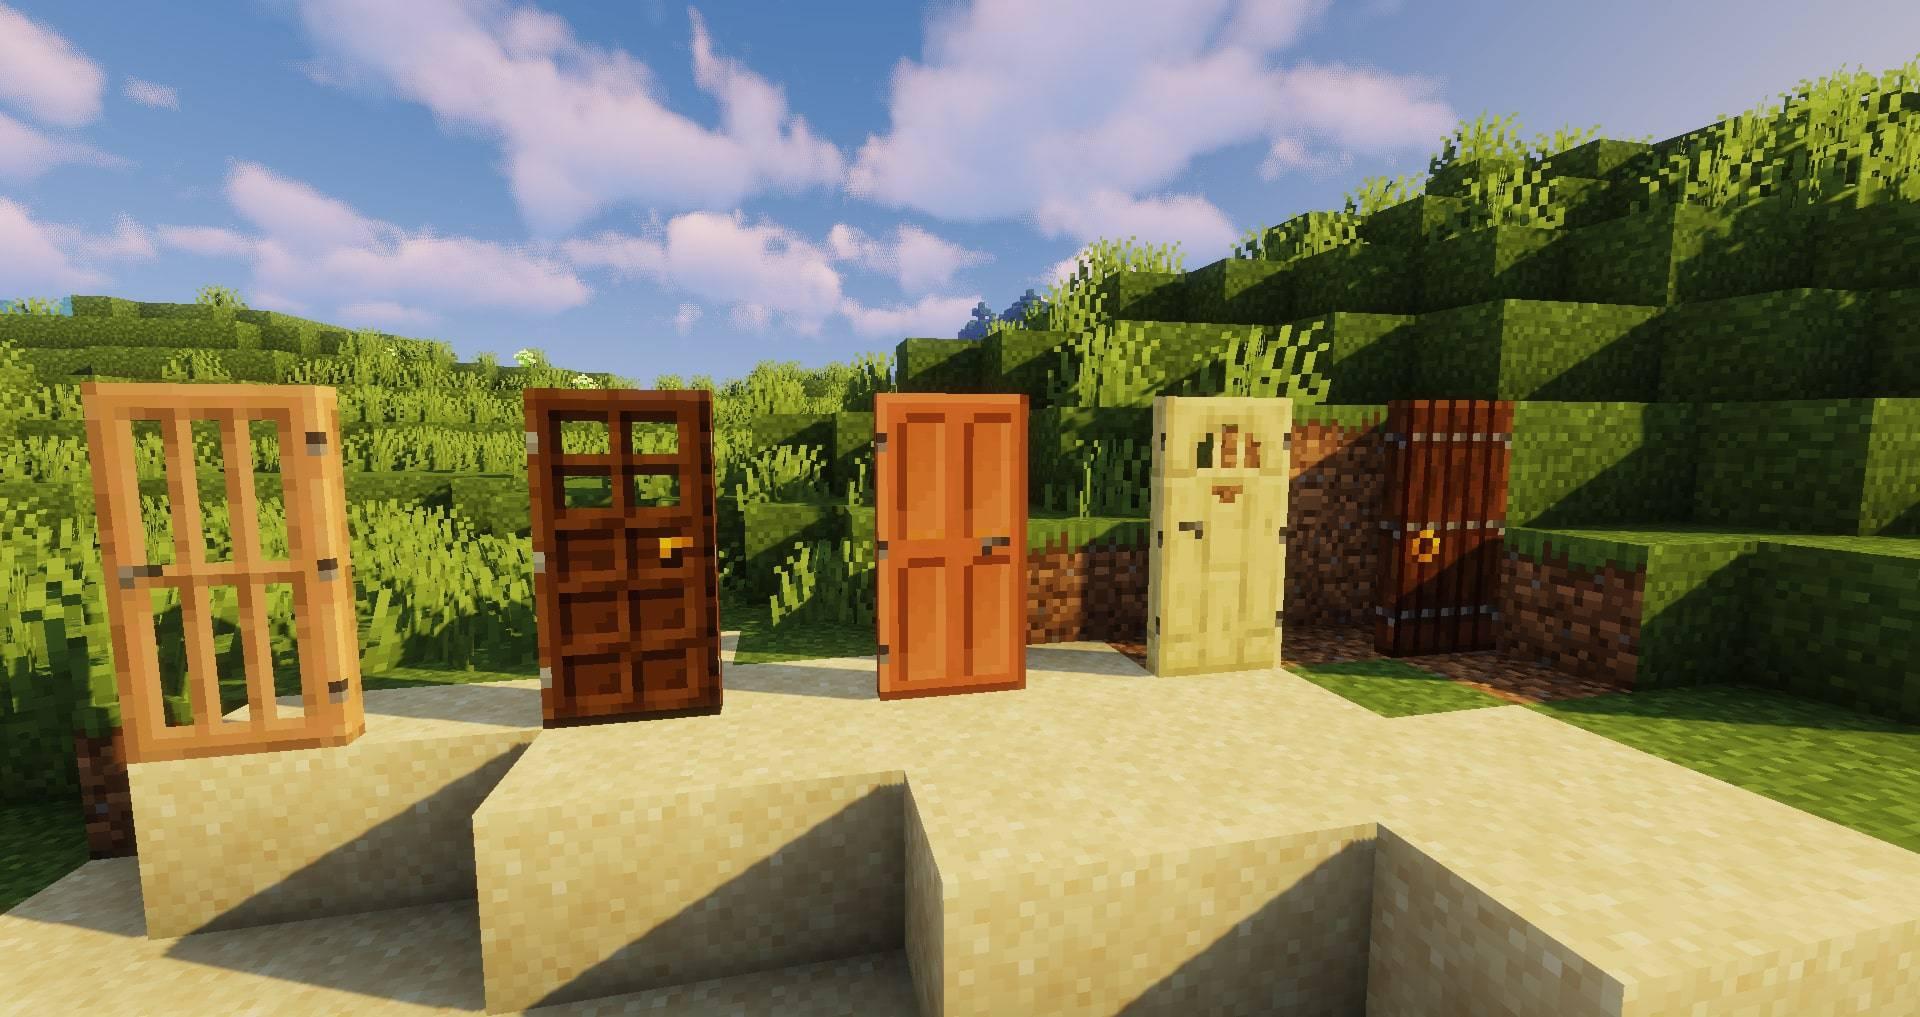 Macaw_s Doors mod for minecraft 27